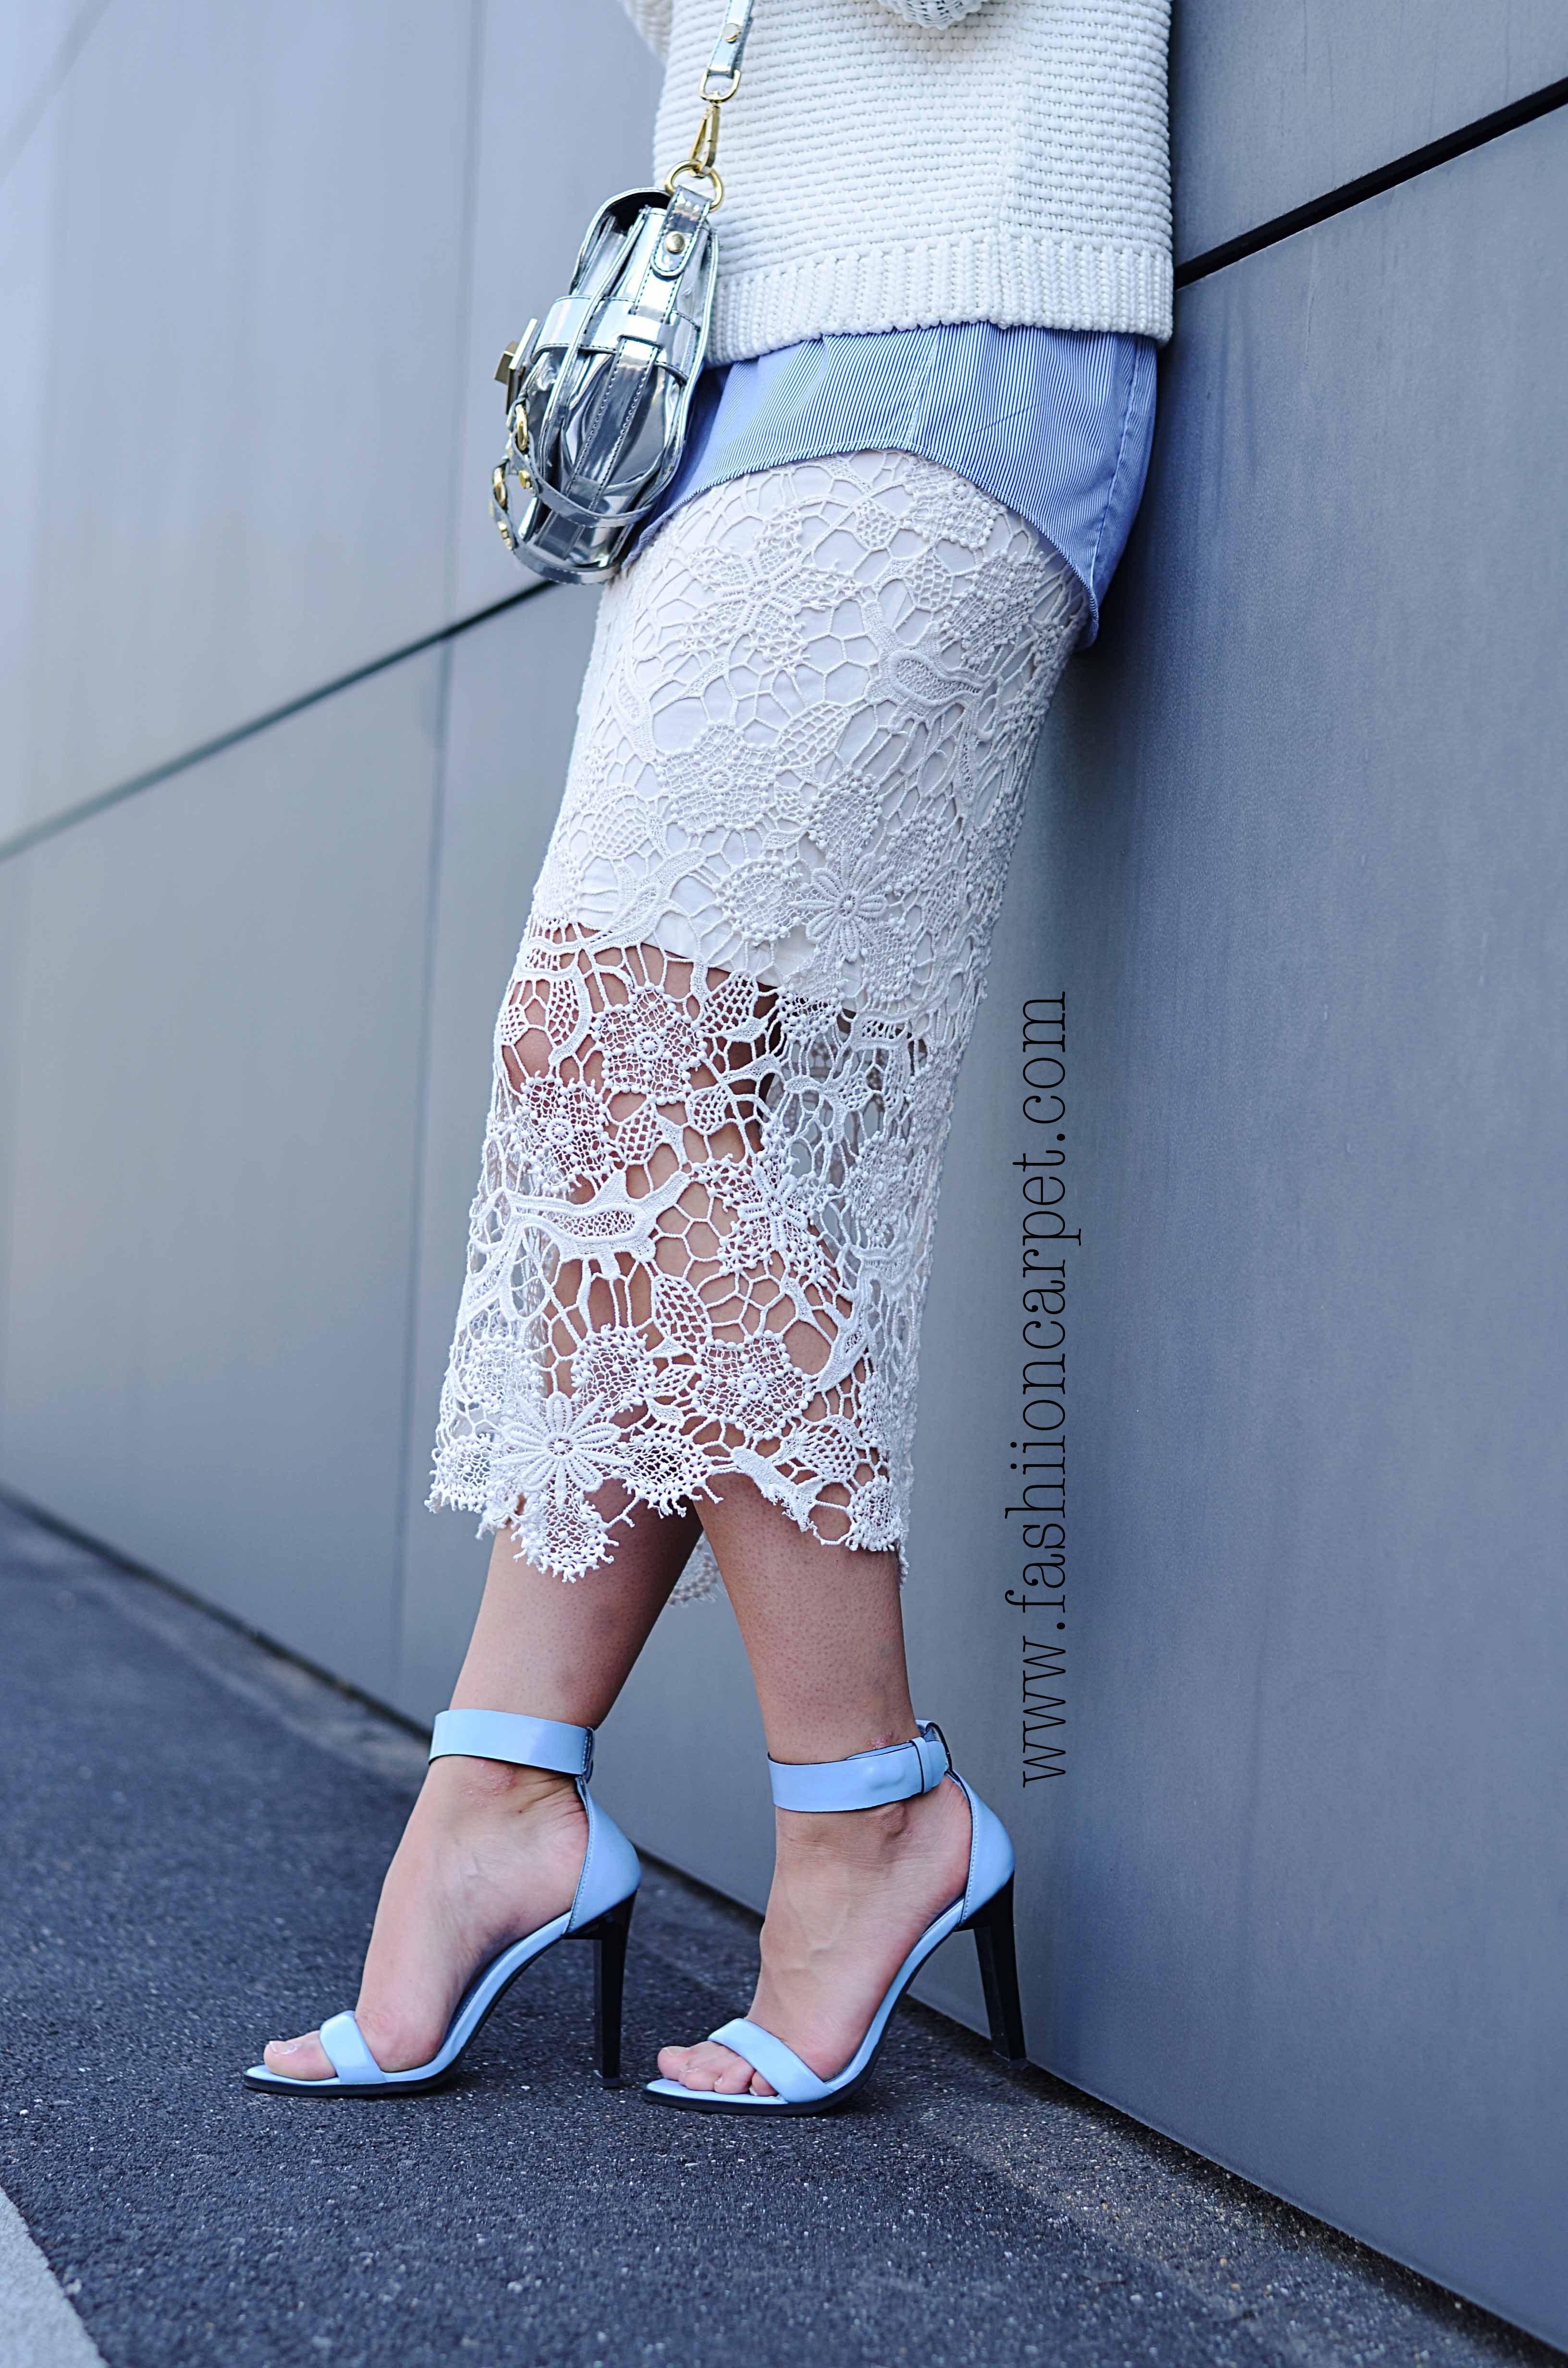 fashiioncarpet-outfit-mode-fashion-modeblogger-fashionblogger-fashionblog-mc3bcnchen-blogger-blog-look-laceskirt-chanelbrooch-chanelbrosche-chanel-brosche-mirrorbag